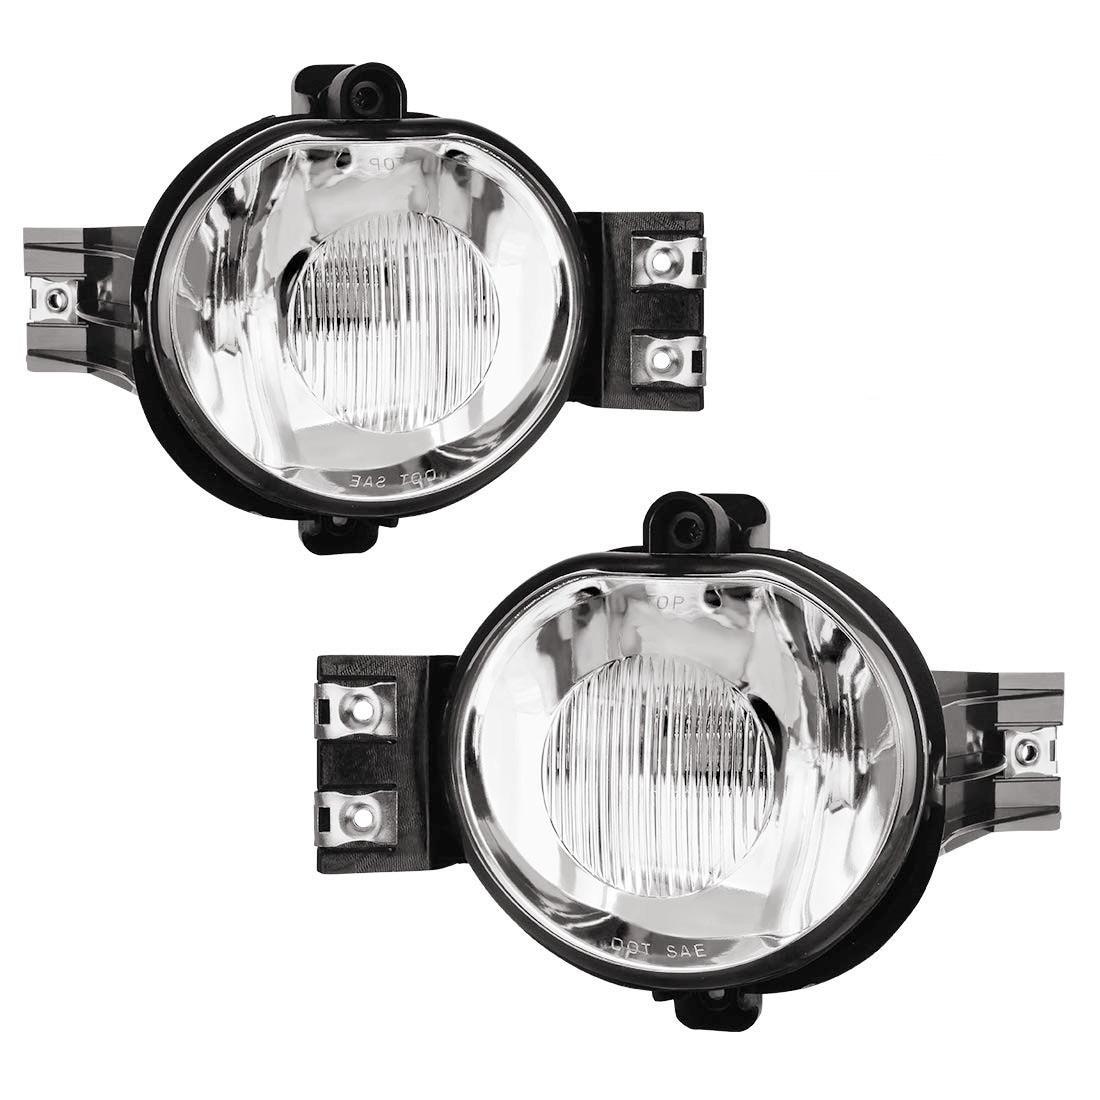 2pcs Chrome Clear Lens Bumper Driving Fog Light  For Dodge Ram Durango 2002 2003 2004 2005 2006 2007 2008 2009